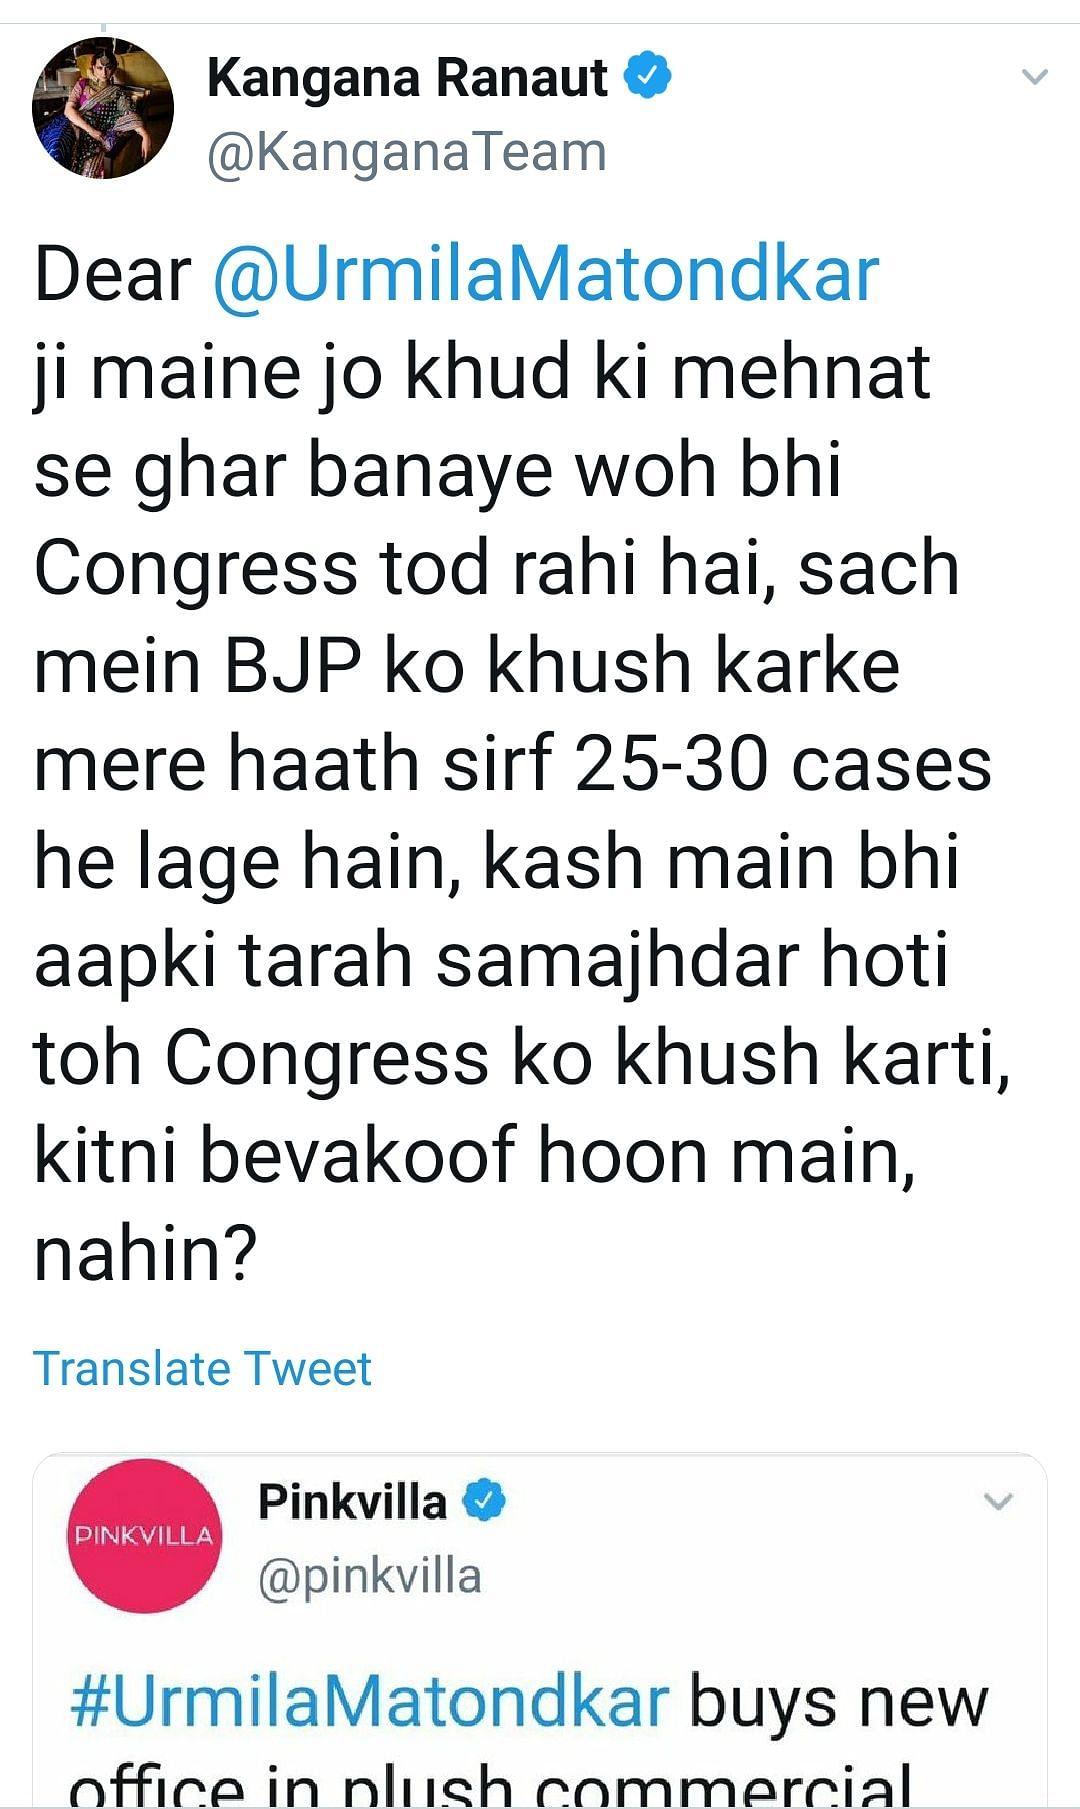 Kangana tweet on Urmila Matondkar.